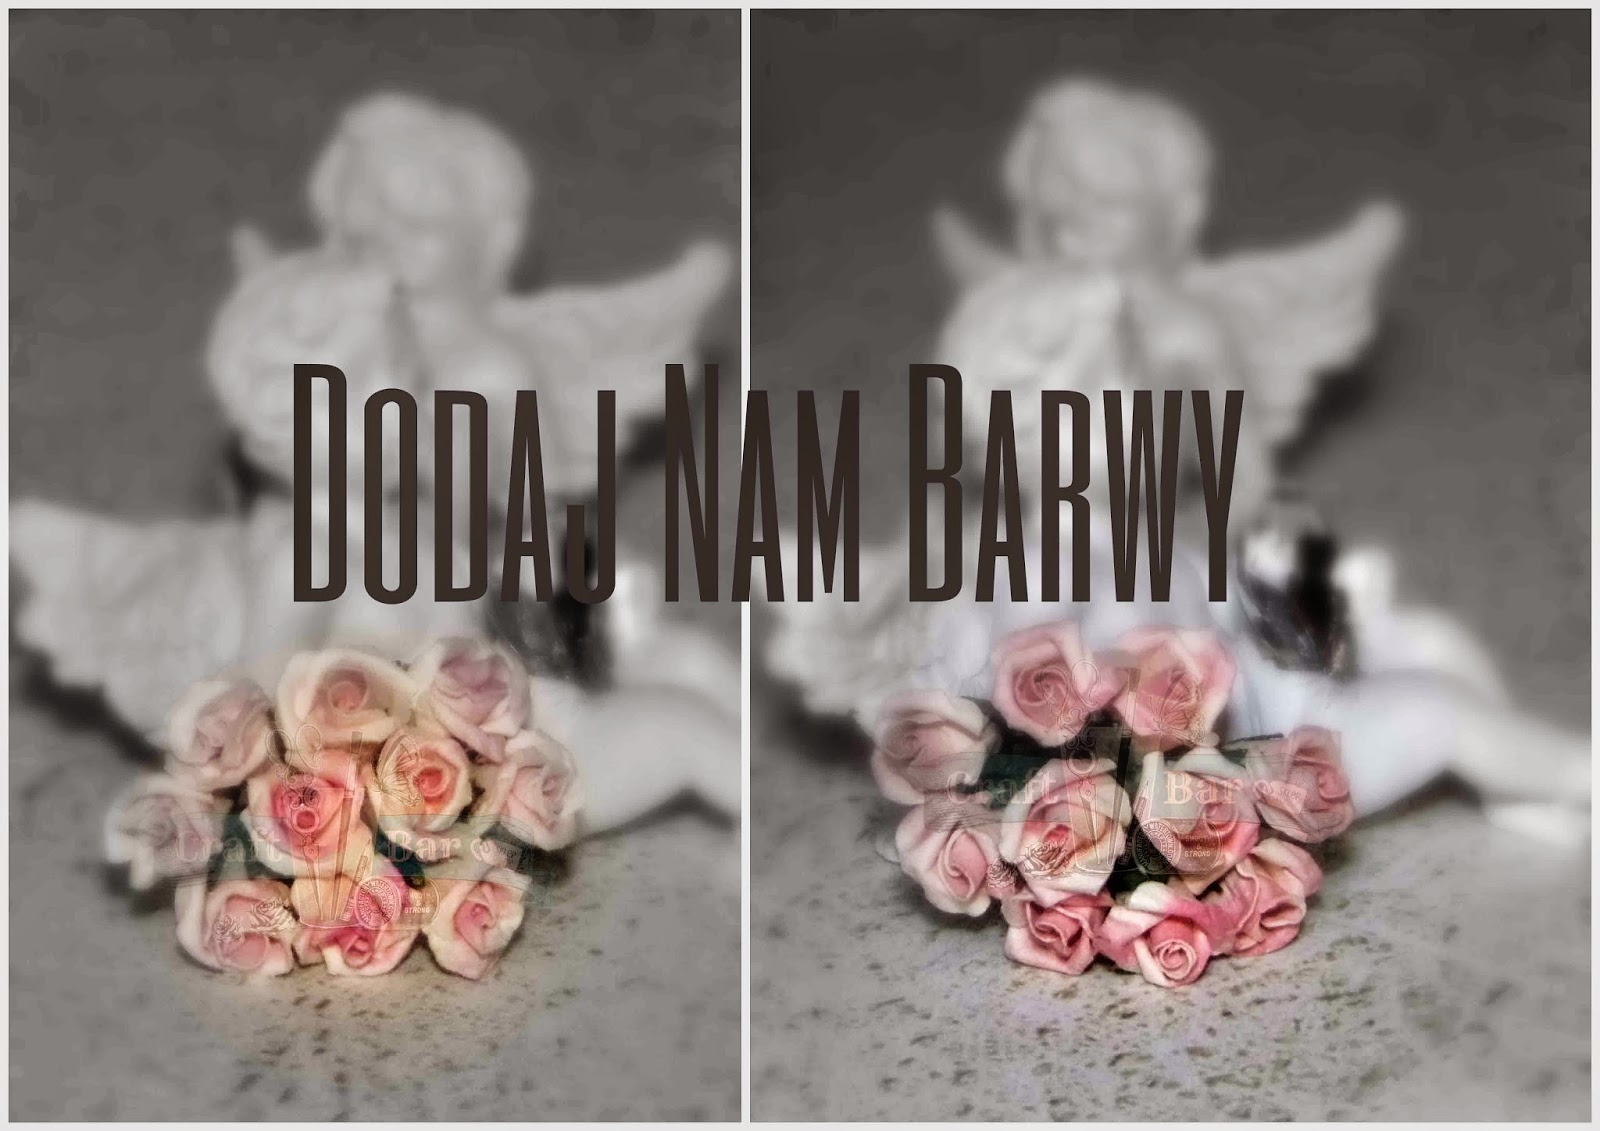 http://blog.craftbar.com.pl/2014/11/konkurs-pt-dodaj-nam-barwy.html#comment-form